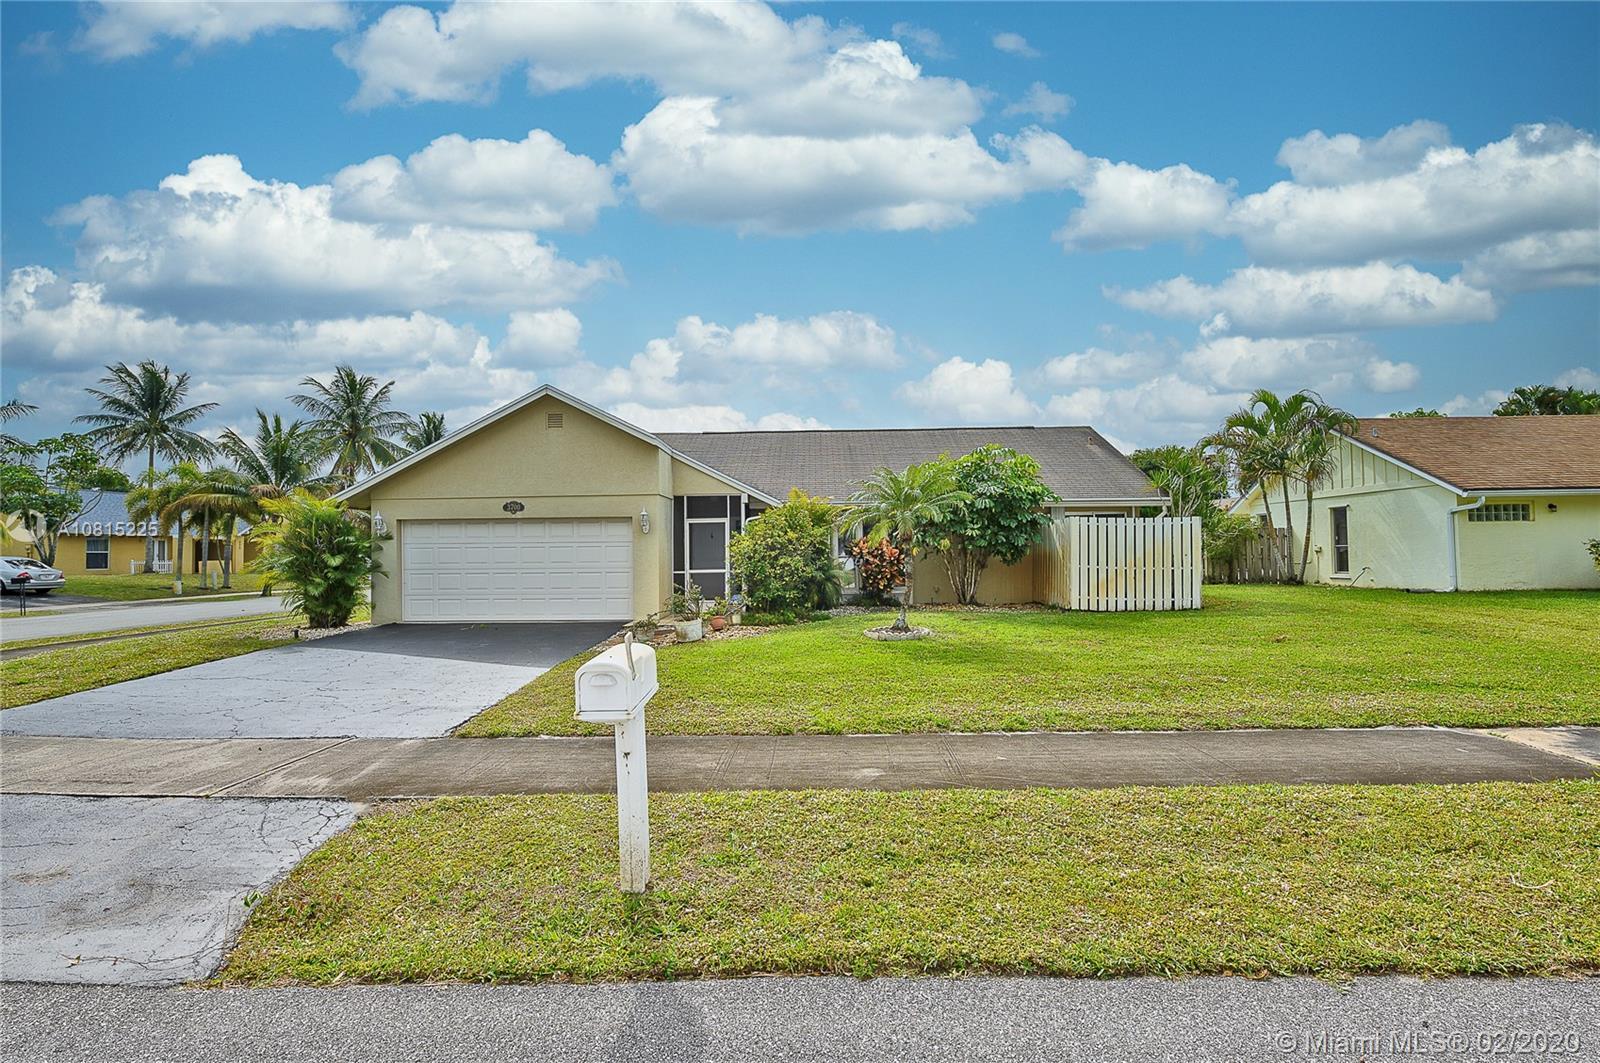 3700 NW 9th St, Delray Beach, FL 33445 - Delray Beach, FL real estate listing